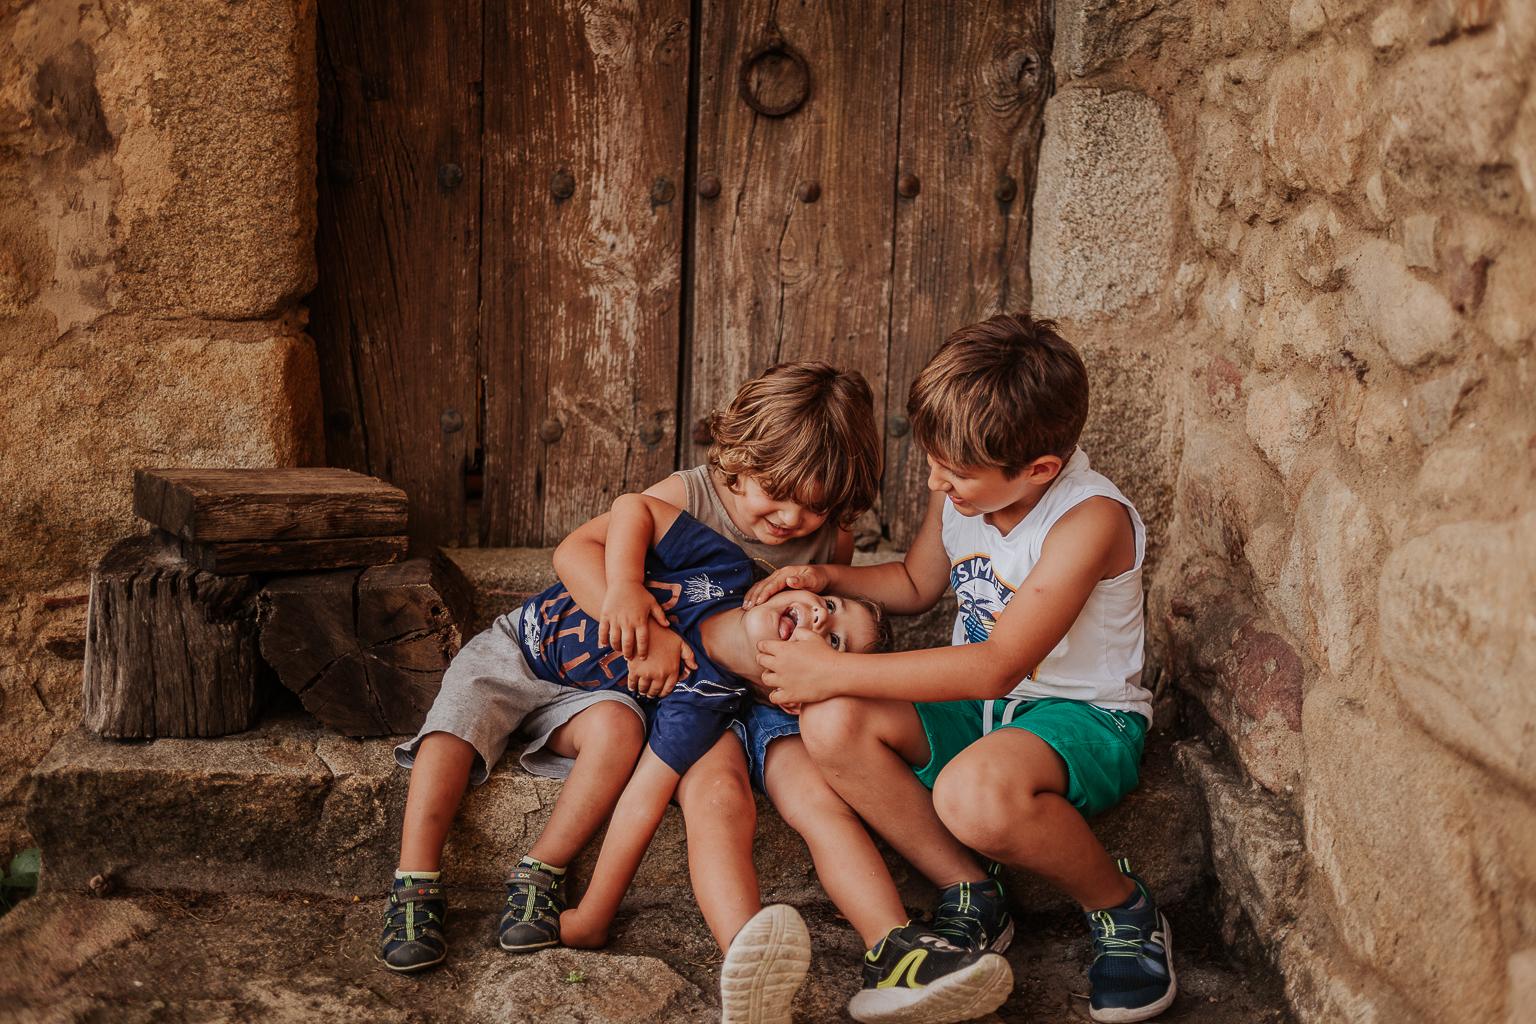 Fotógrafo familiar Girona :: fotografía familiar girona :: Costa brava :: Masía Catalana :: Família numerosa :: Fotografía natural famililiar